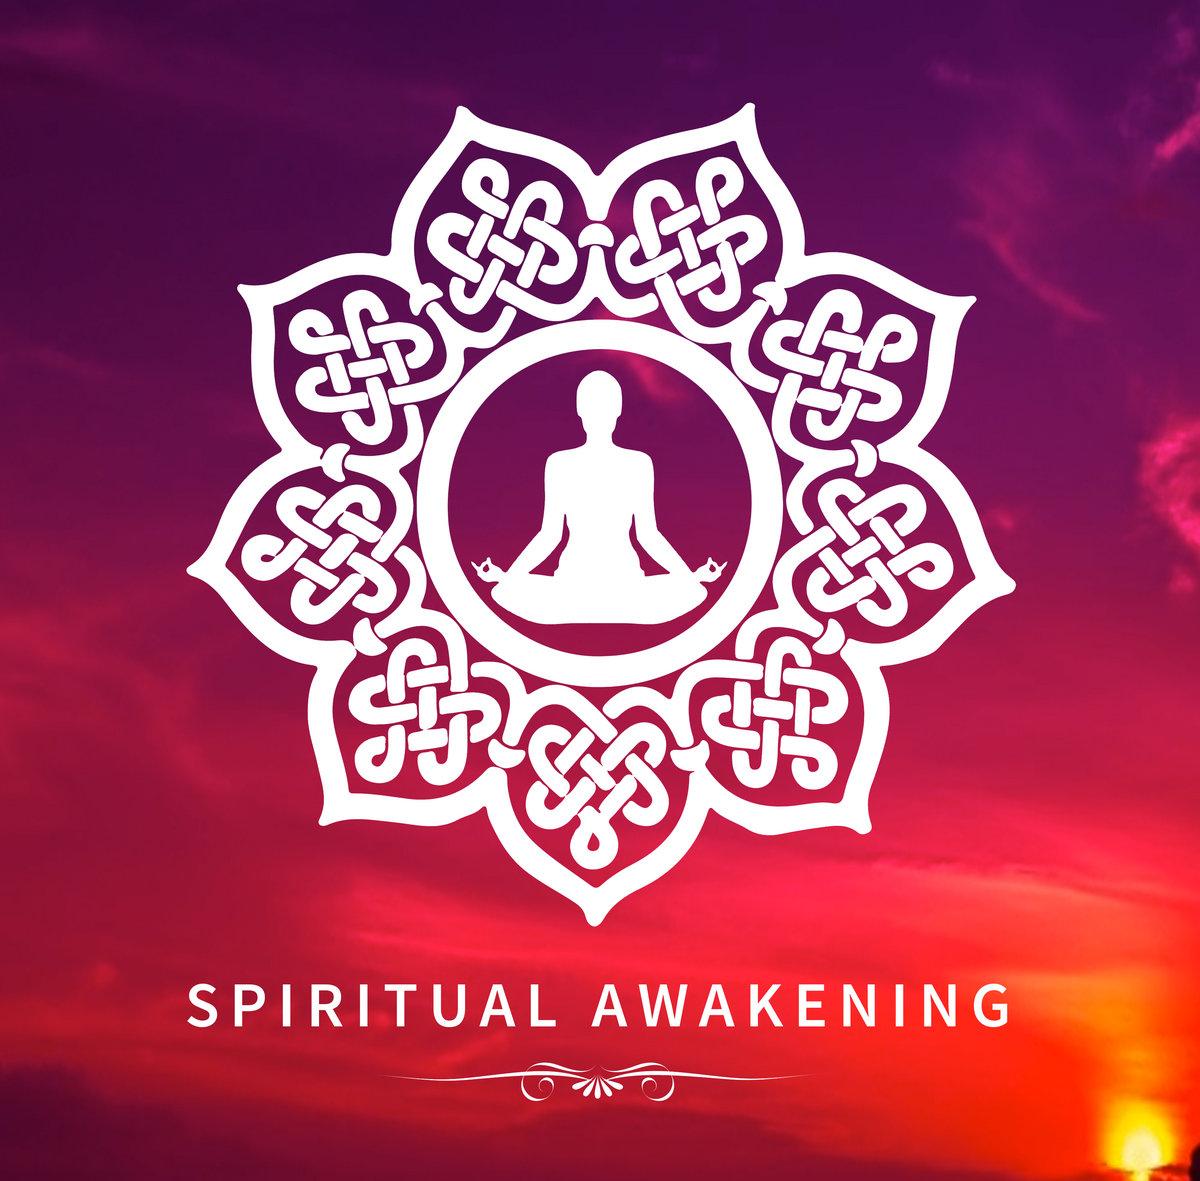 Music spiritual awakening meditation music spiritual awakening meditation music image biocorpaavc